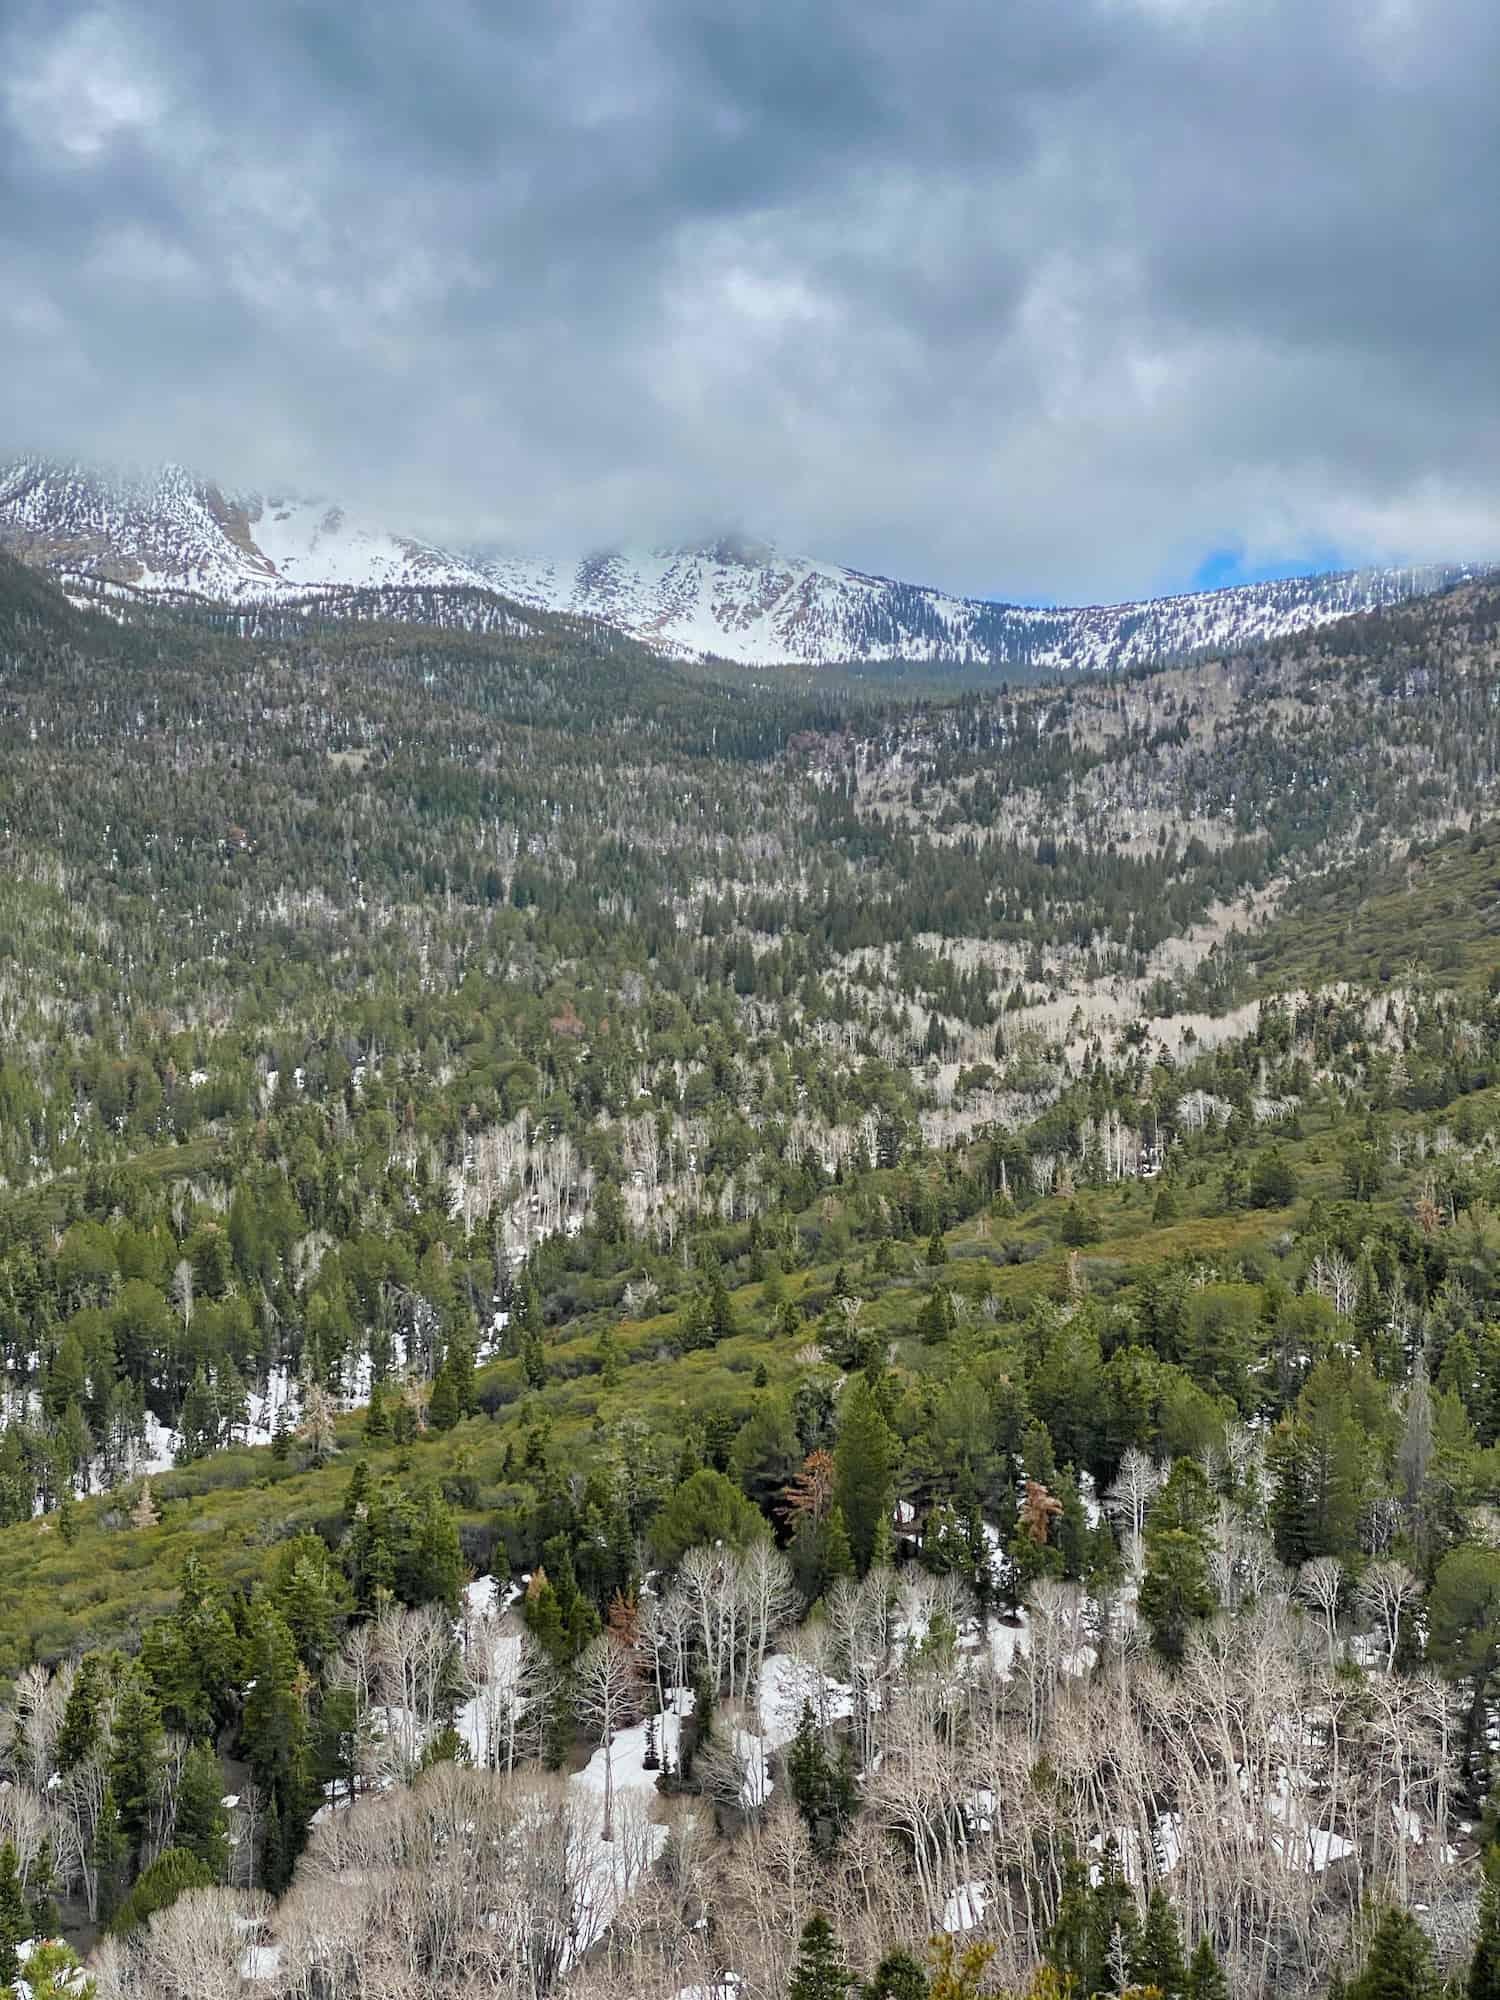 One Day in Great Basin - The View Toward Wheeler Peak